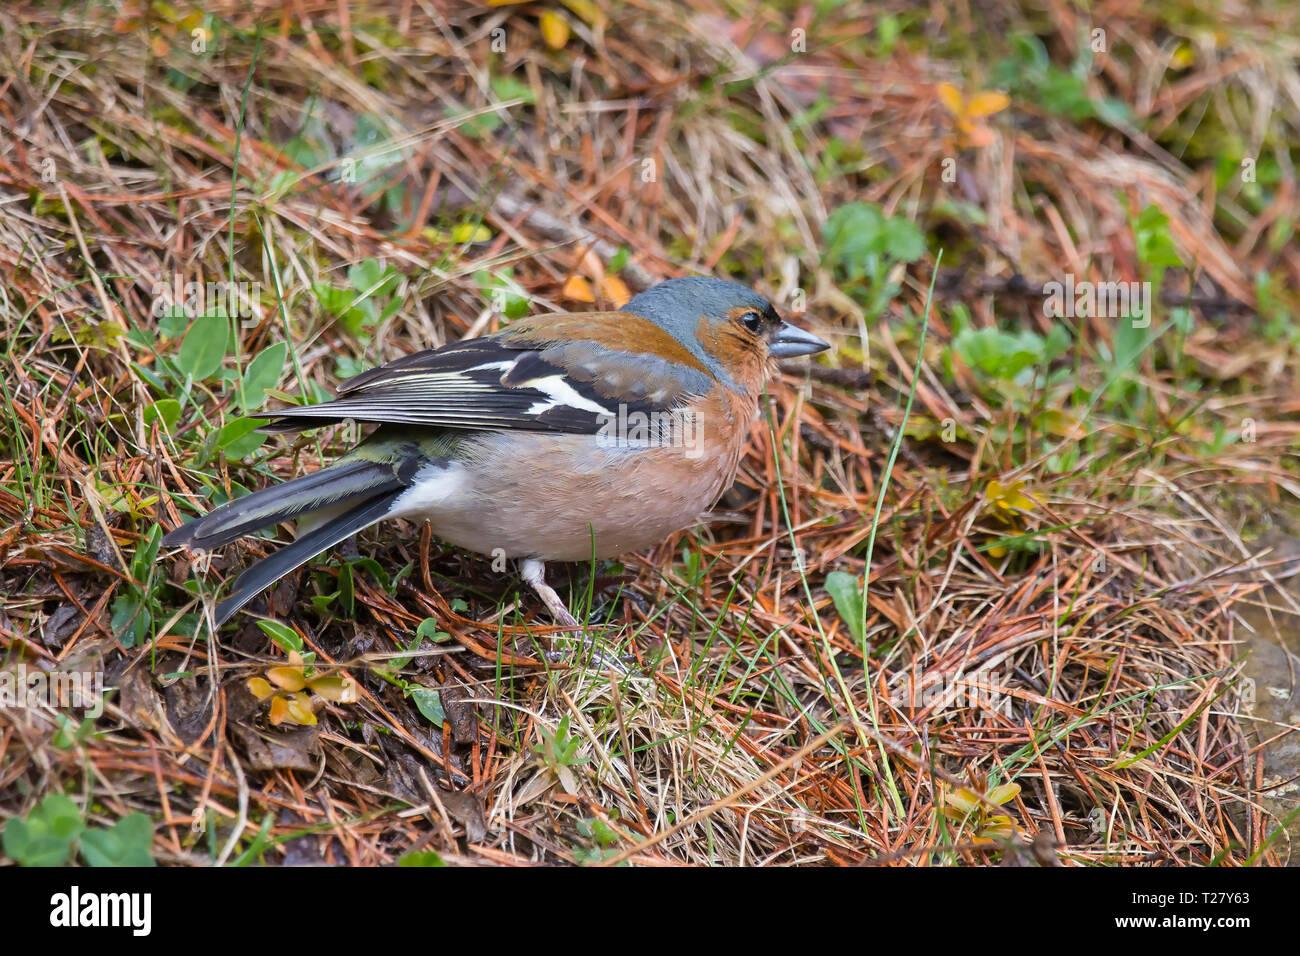 Chaffinches (fringilla coelebs) in Bujaruelo valley, Ordesa y Monte Perdido national park. Stock Photo